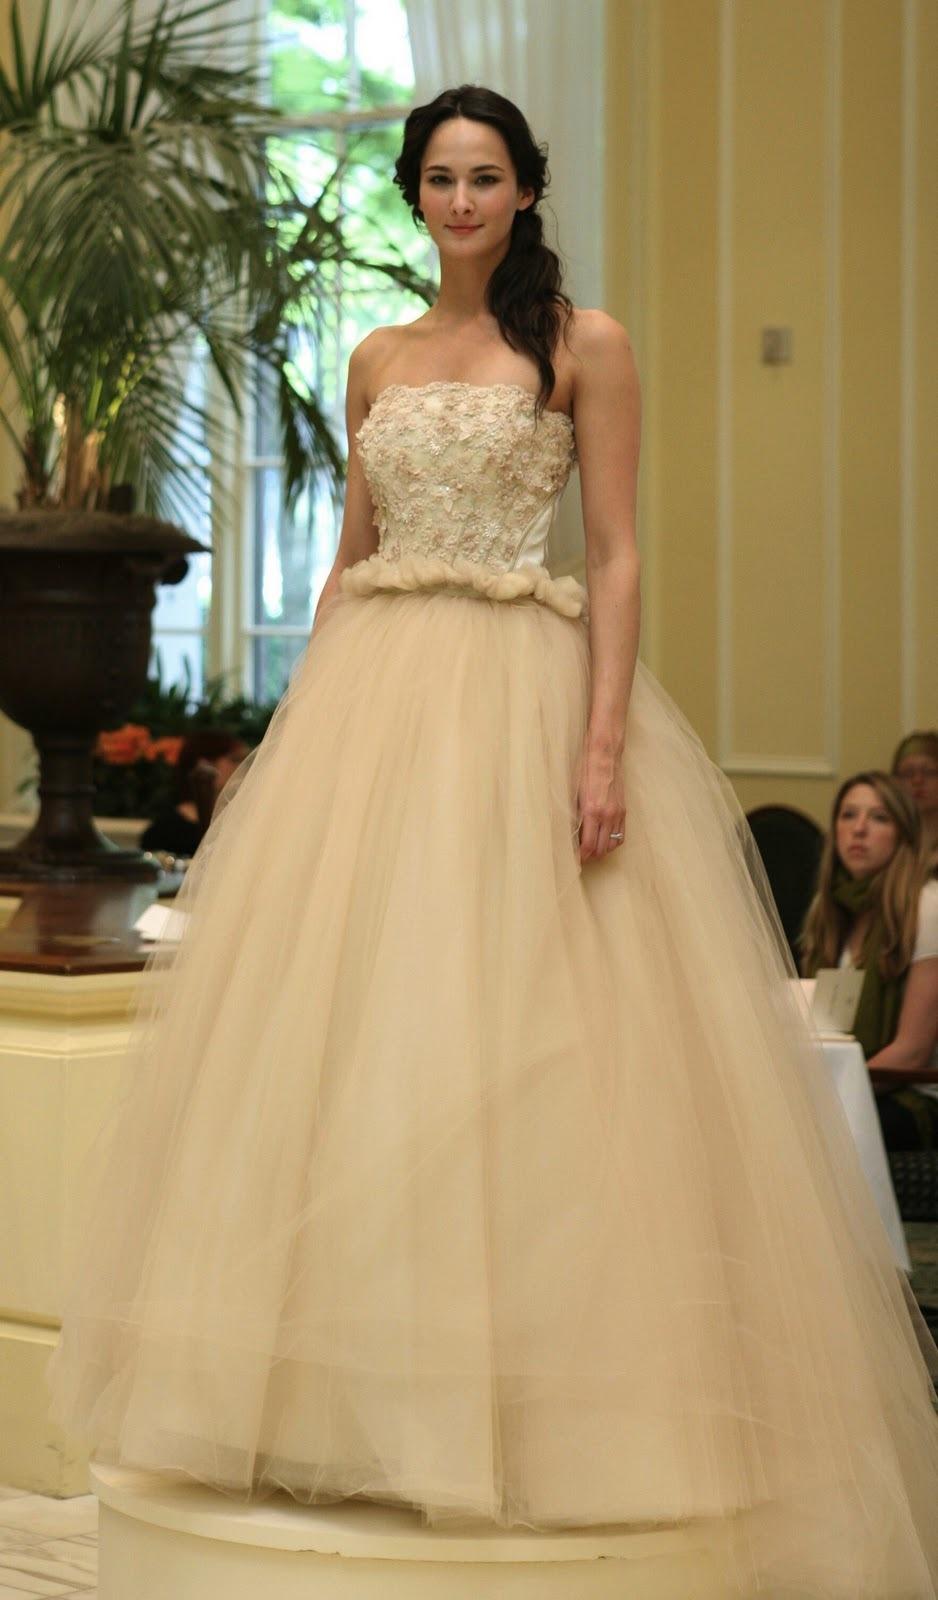 Beige Romantic Tulle Ballgown Wedding Dress